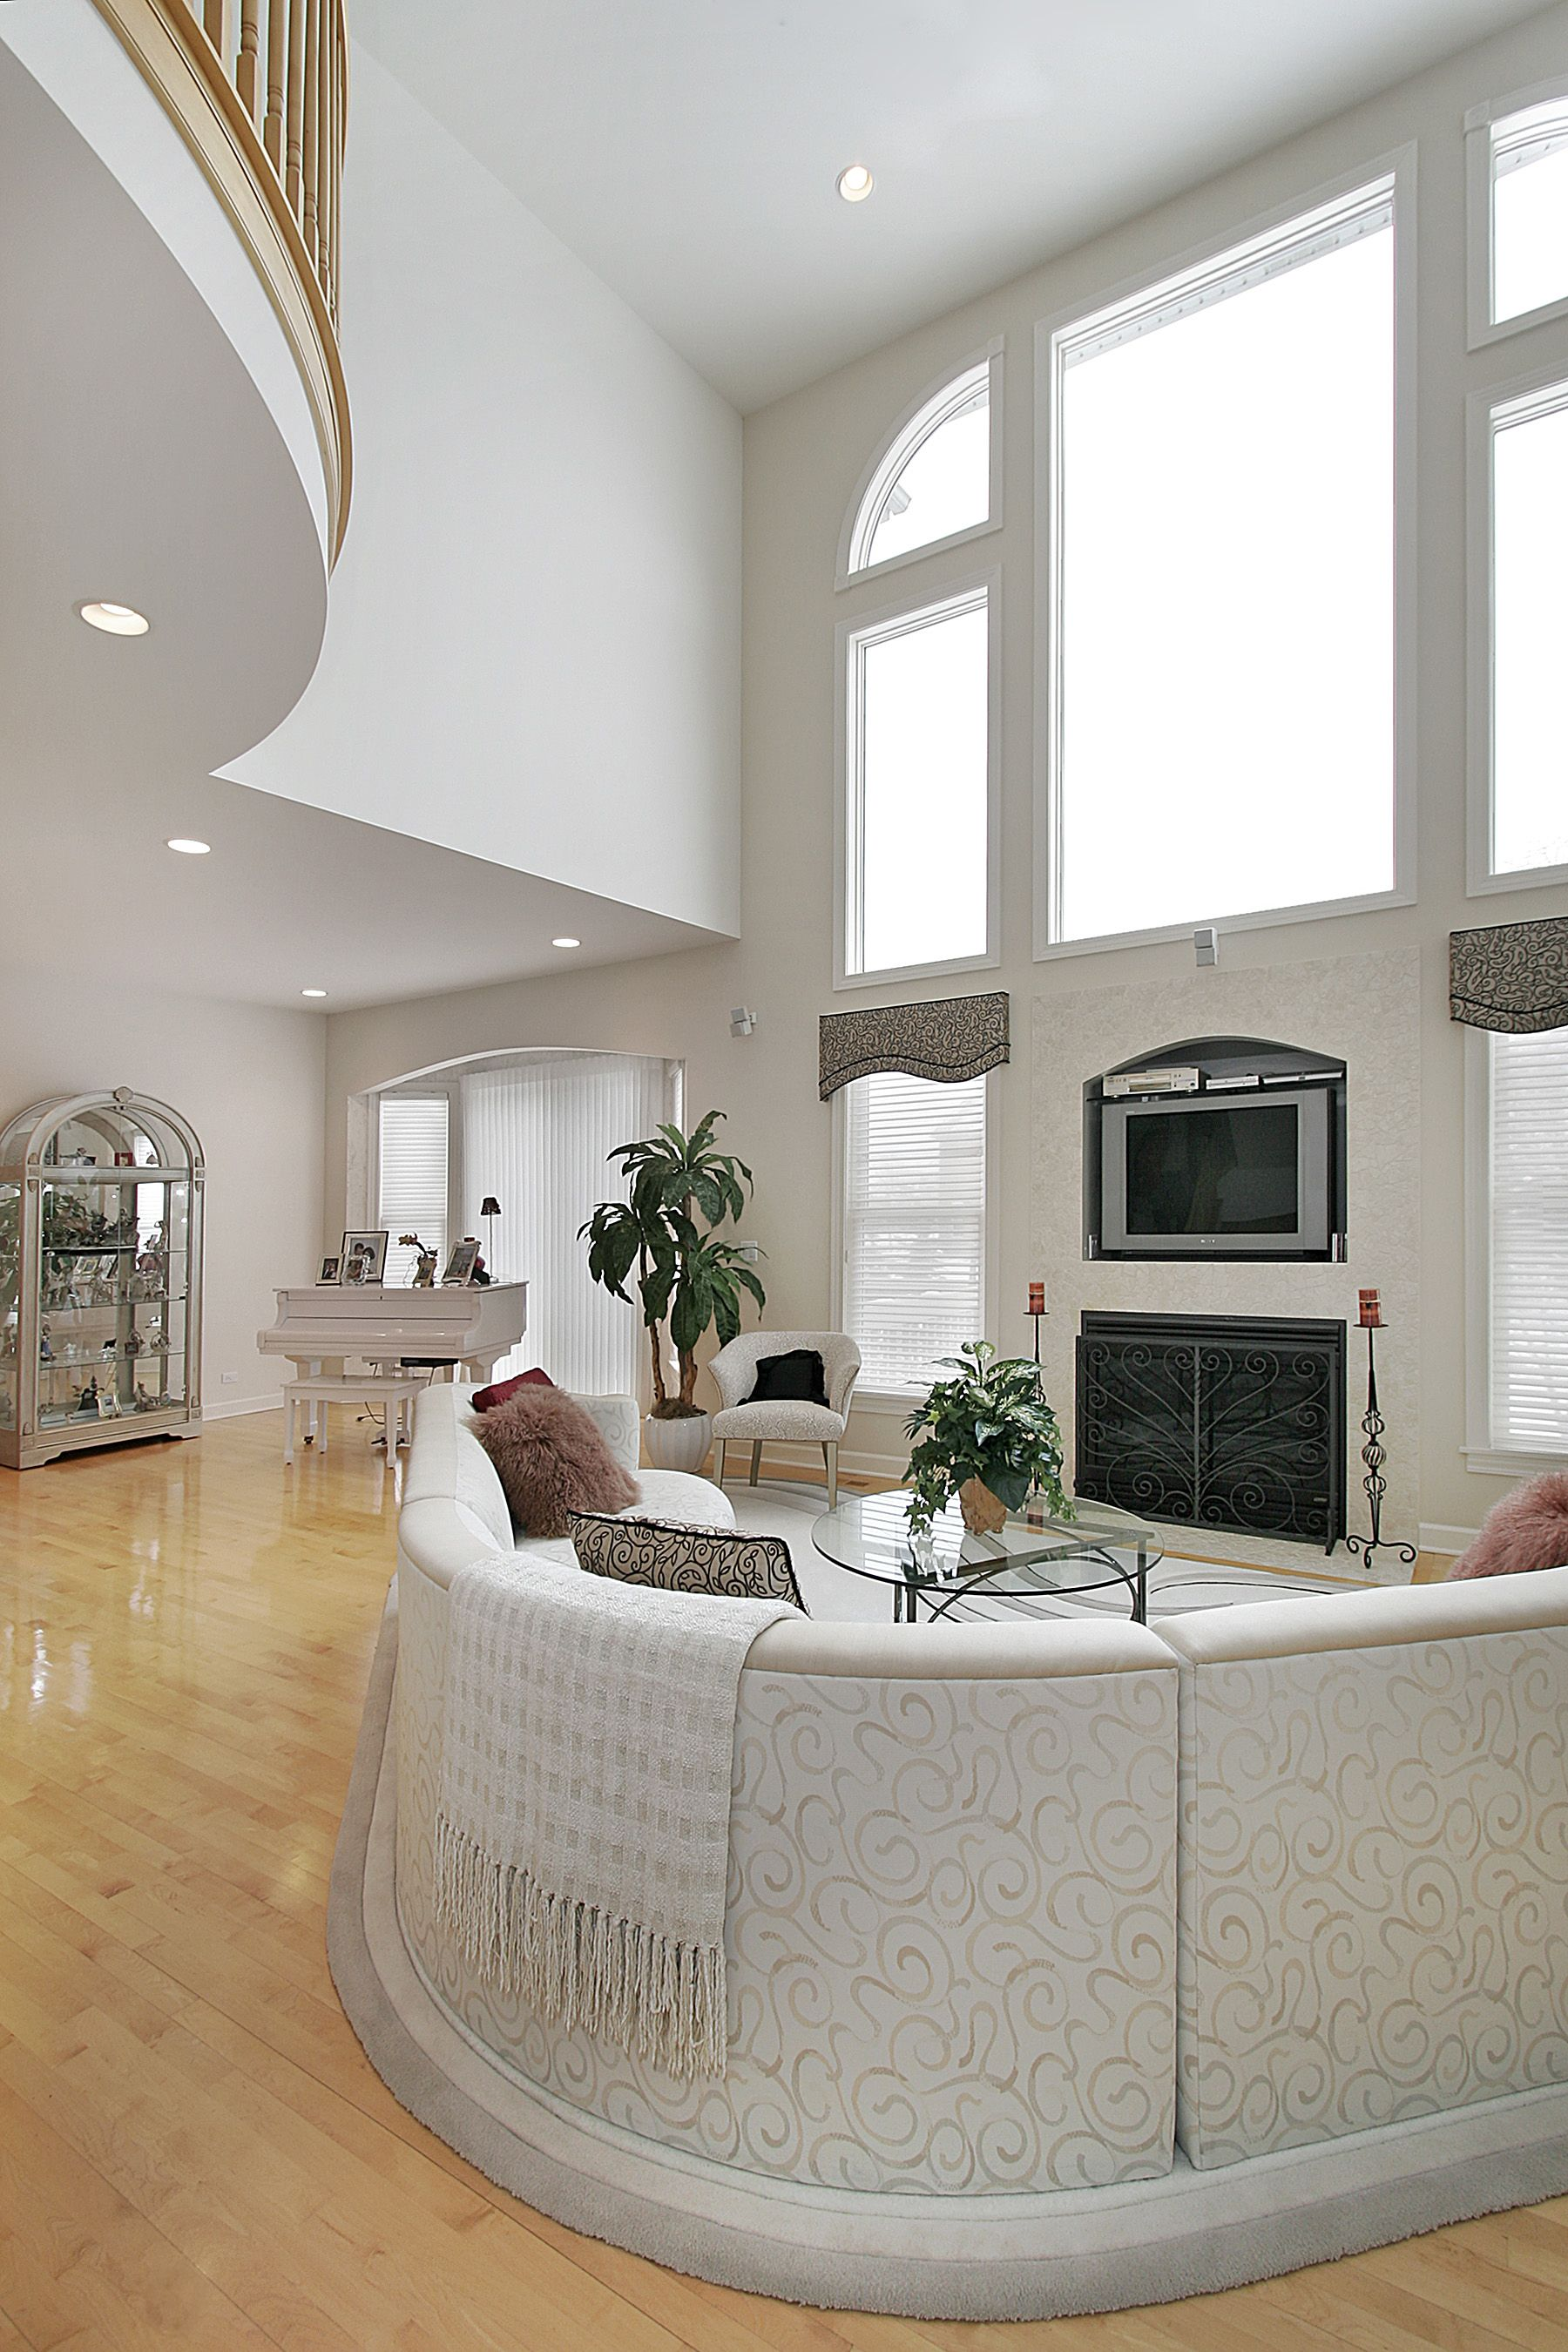 101 Beautiful Formal Living Room Ideas Photos Living Room Furniture Layout Casual Living Room Design Furniture Design Living Room #sofa #for #formal #living #room